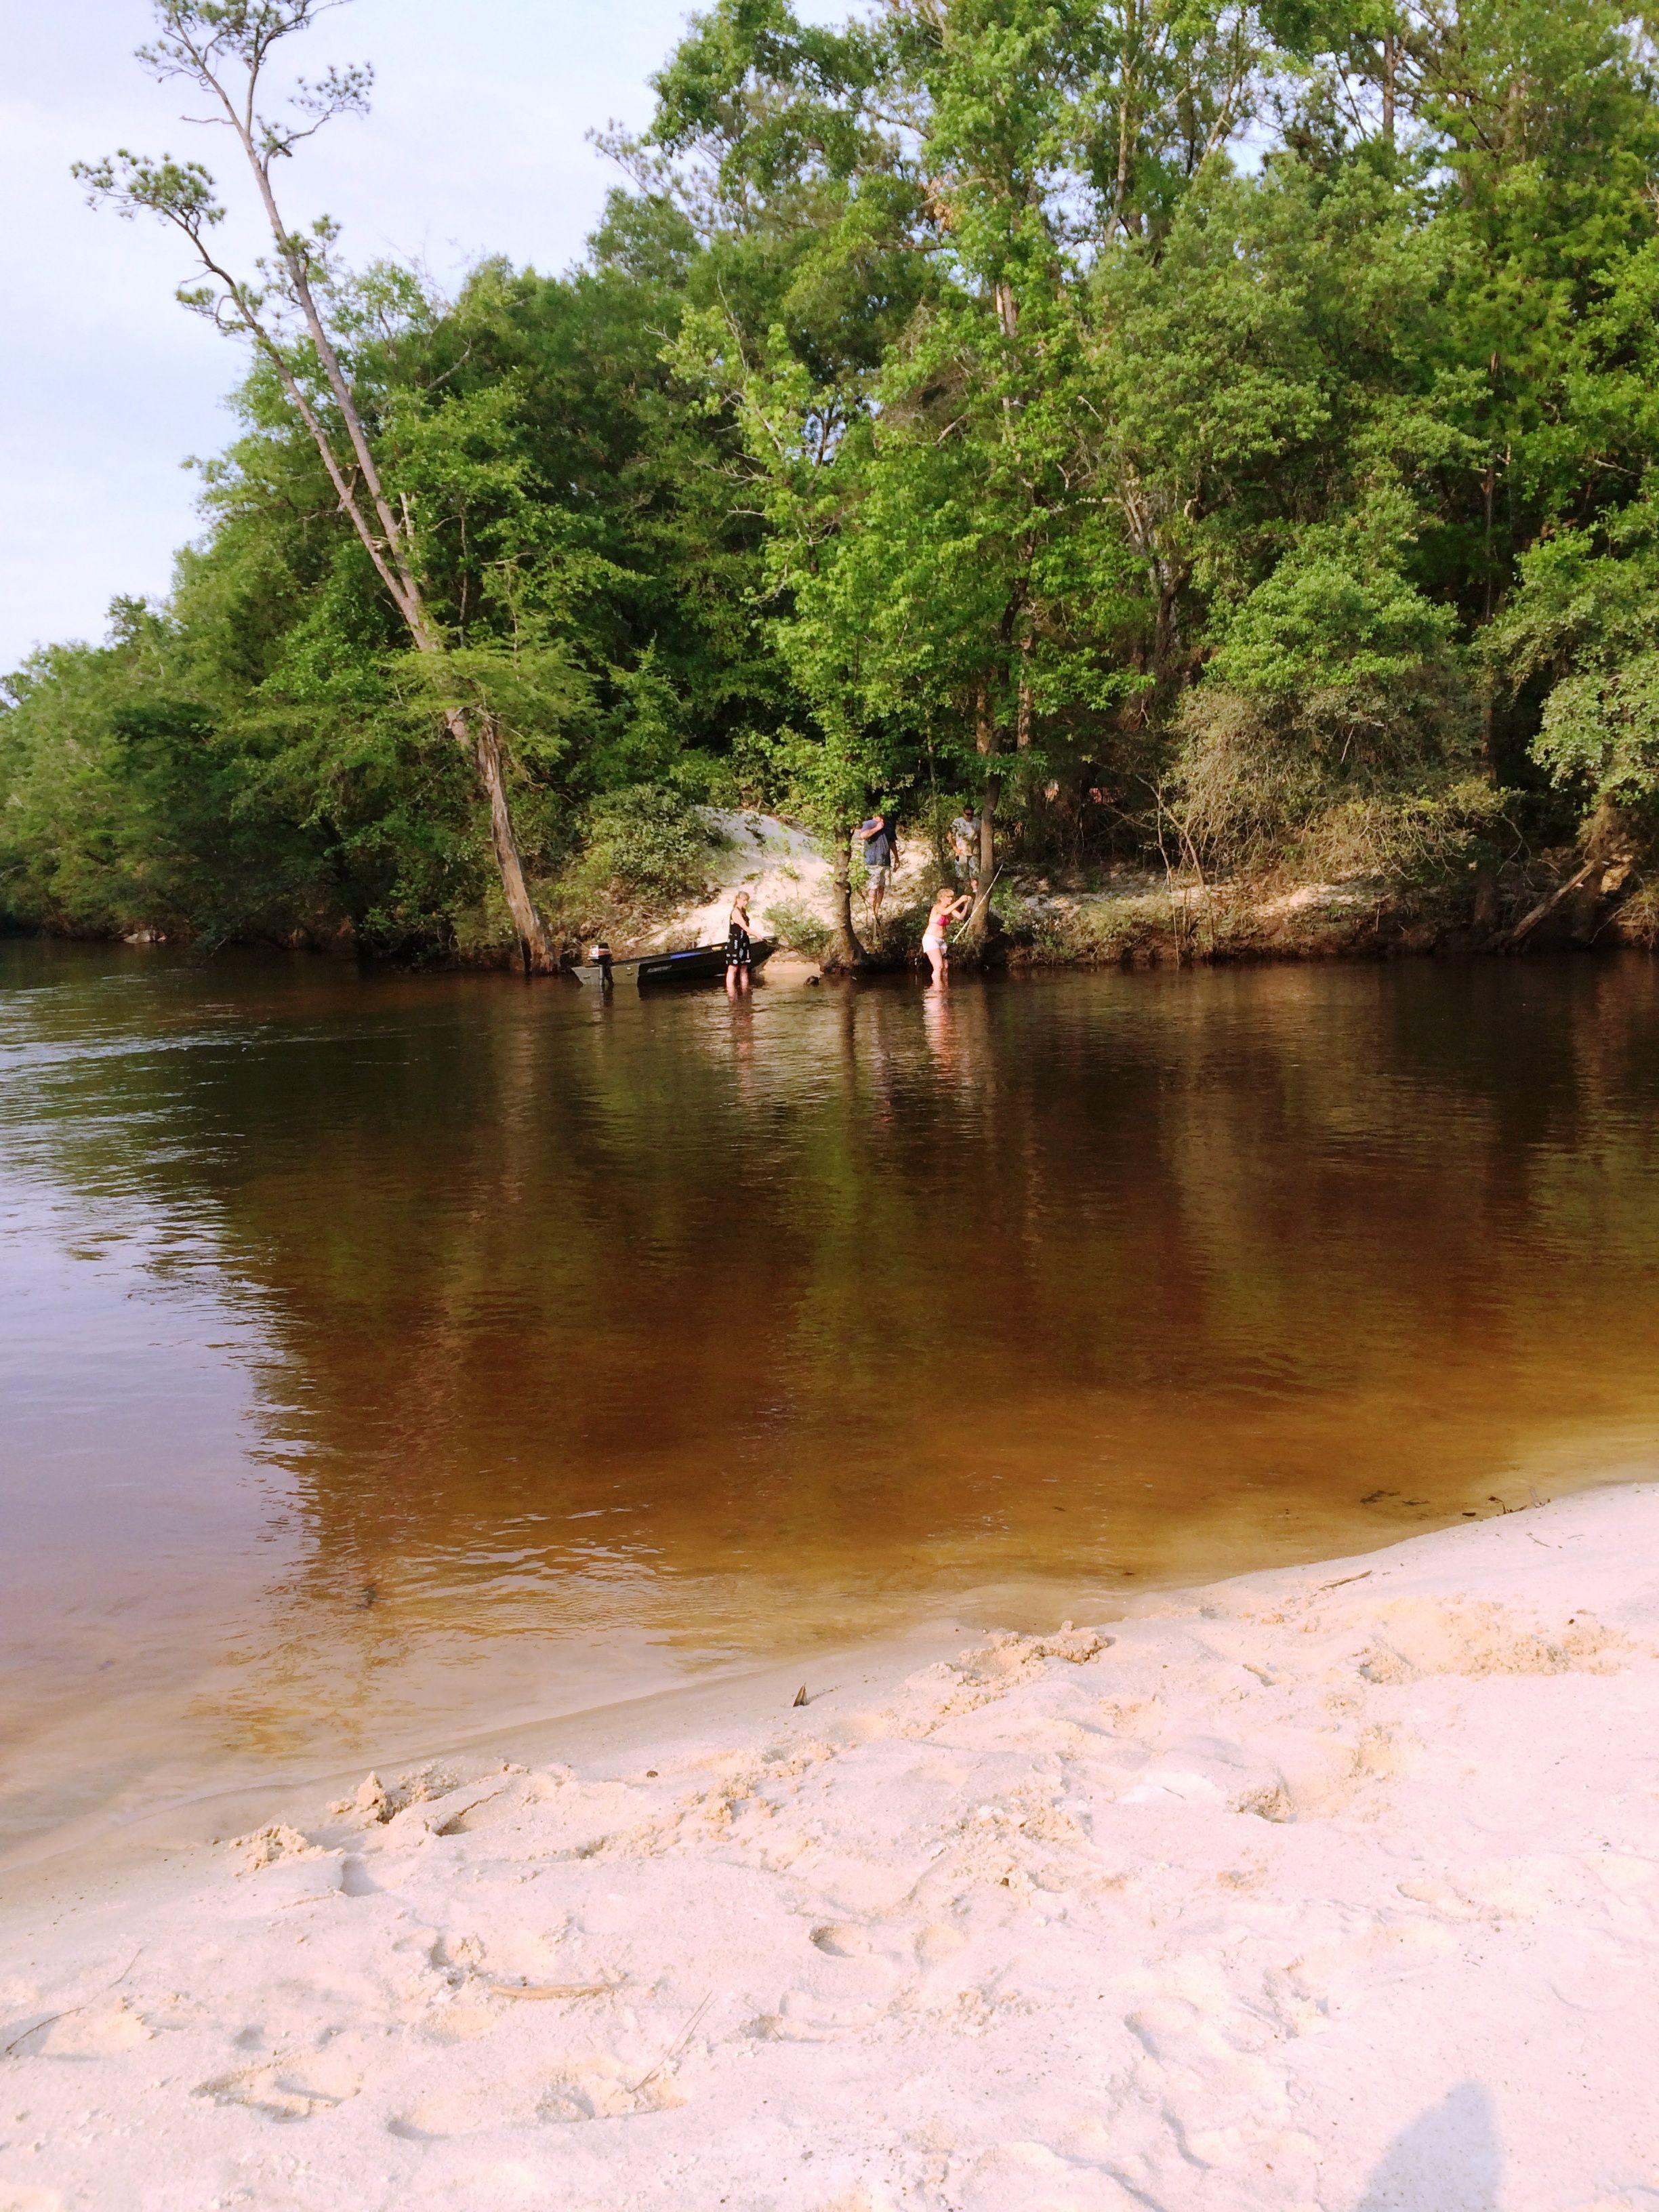 Shoal River Crestview Fl Florida Travel Crestview Florida Crestview Fl